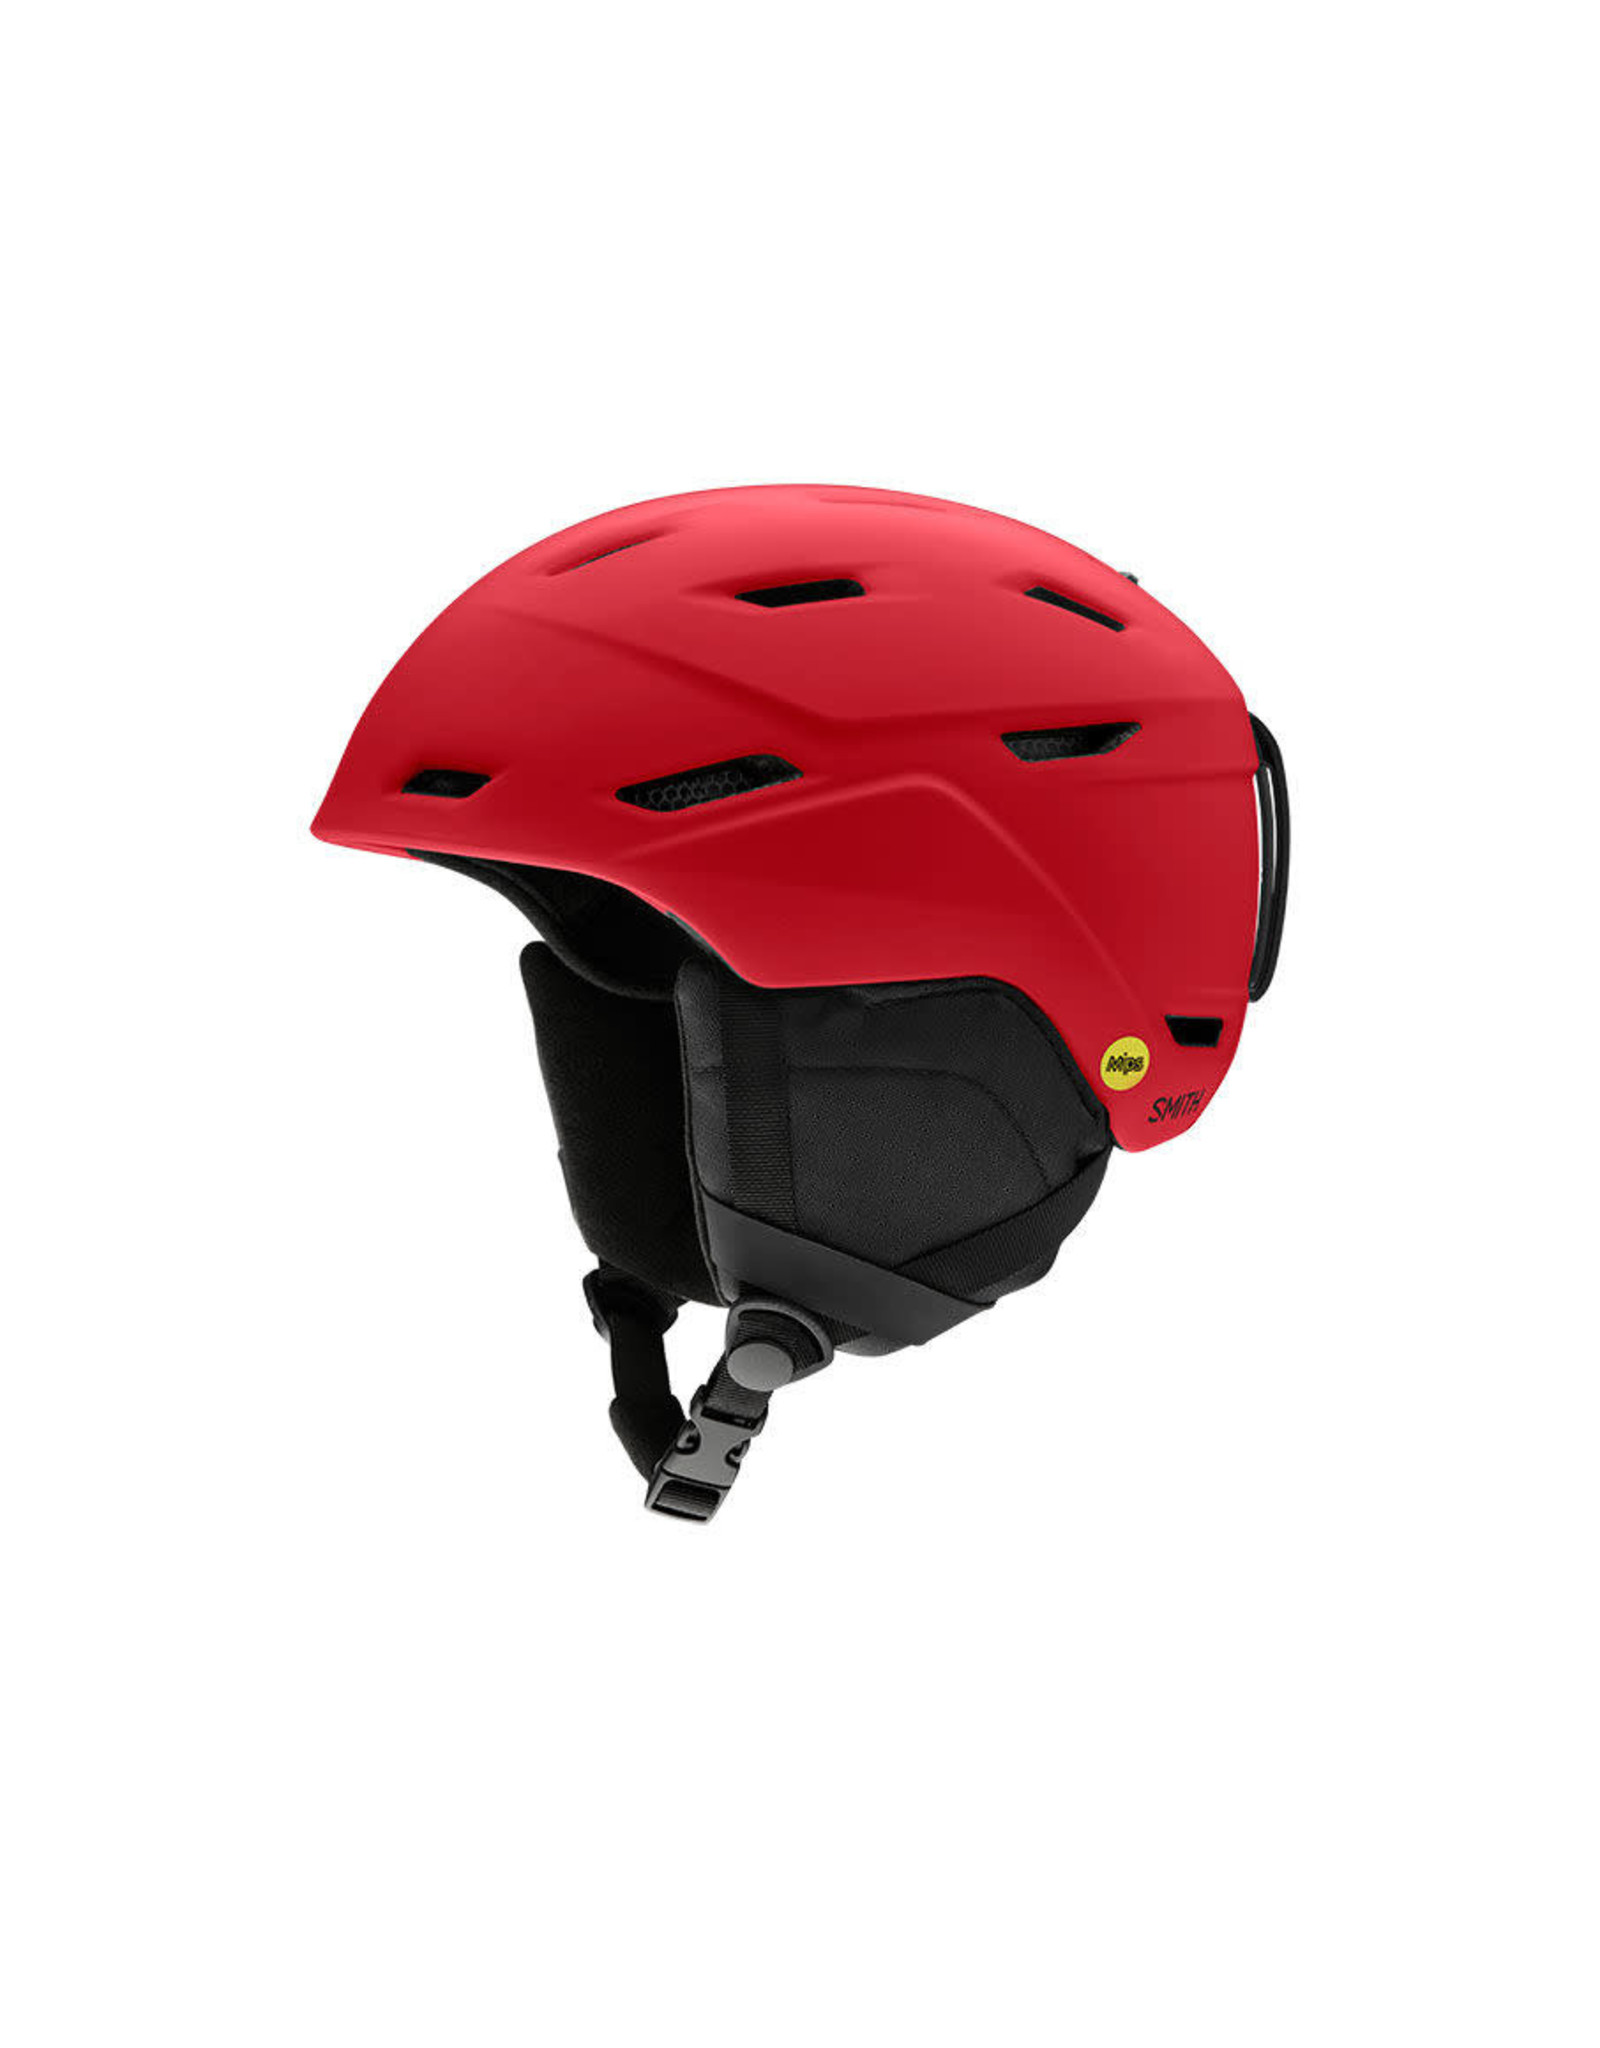 smith optics Smith Mission mips helmet - Matte lava - Large 59-63 cm